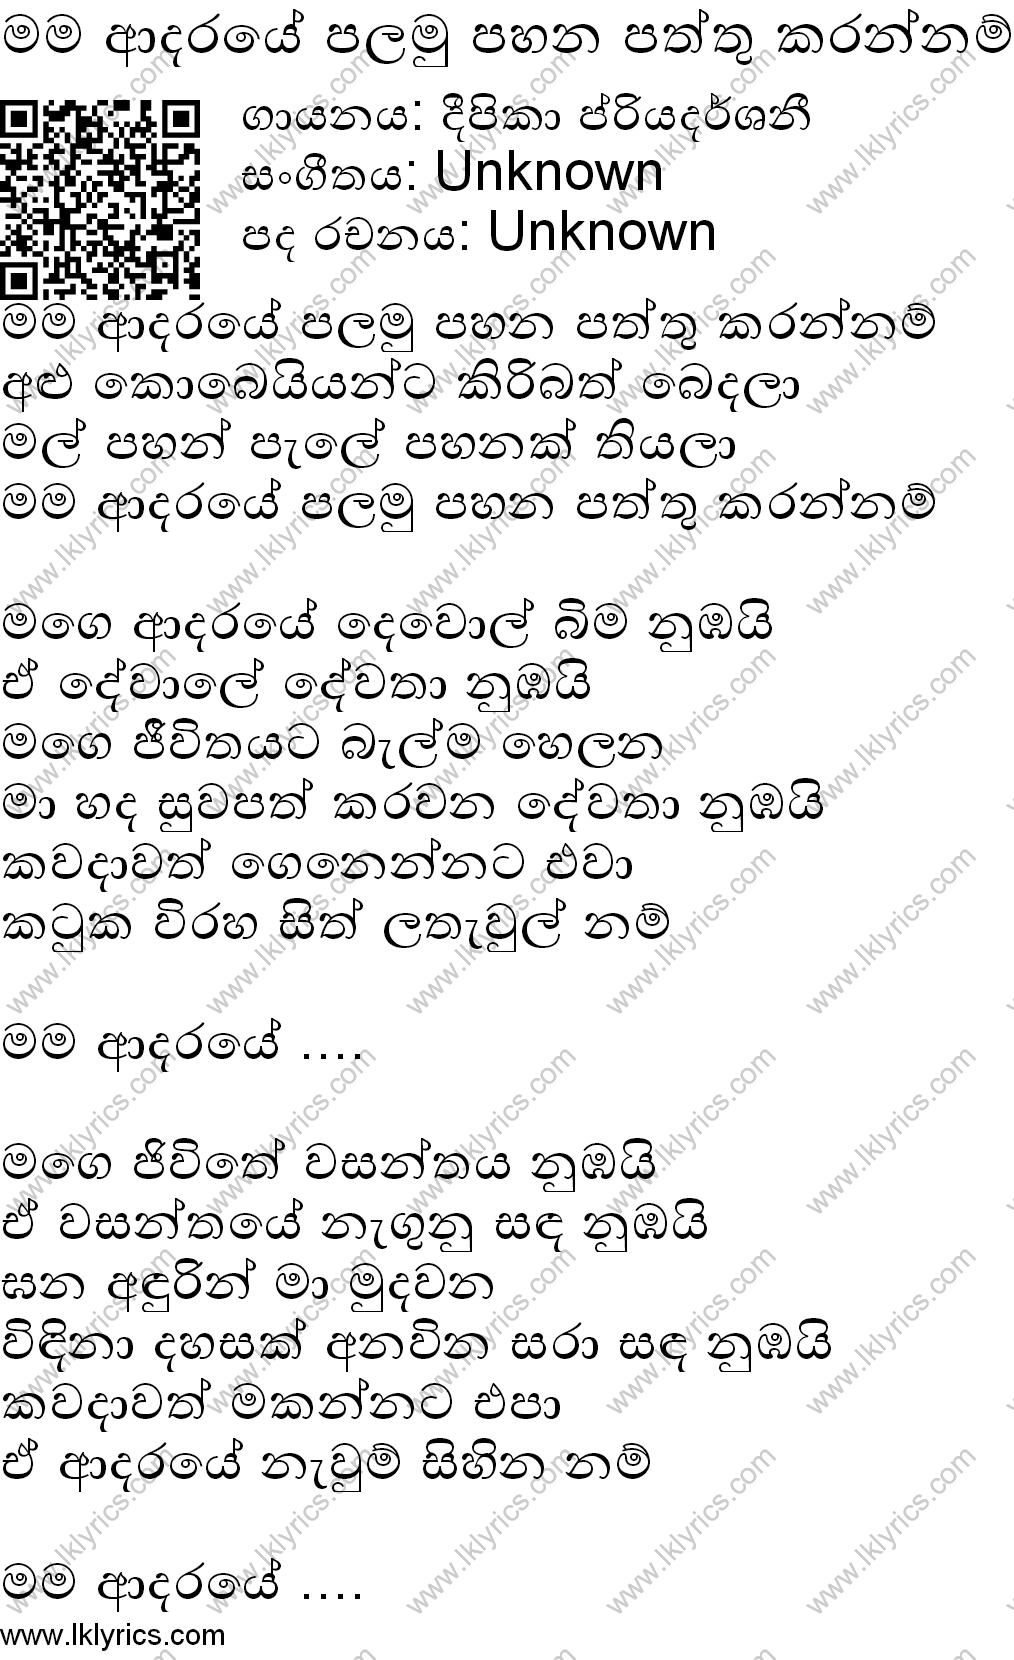 LK Lyrics - Sinhala Song Lyrics